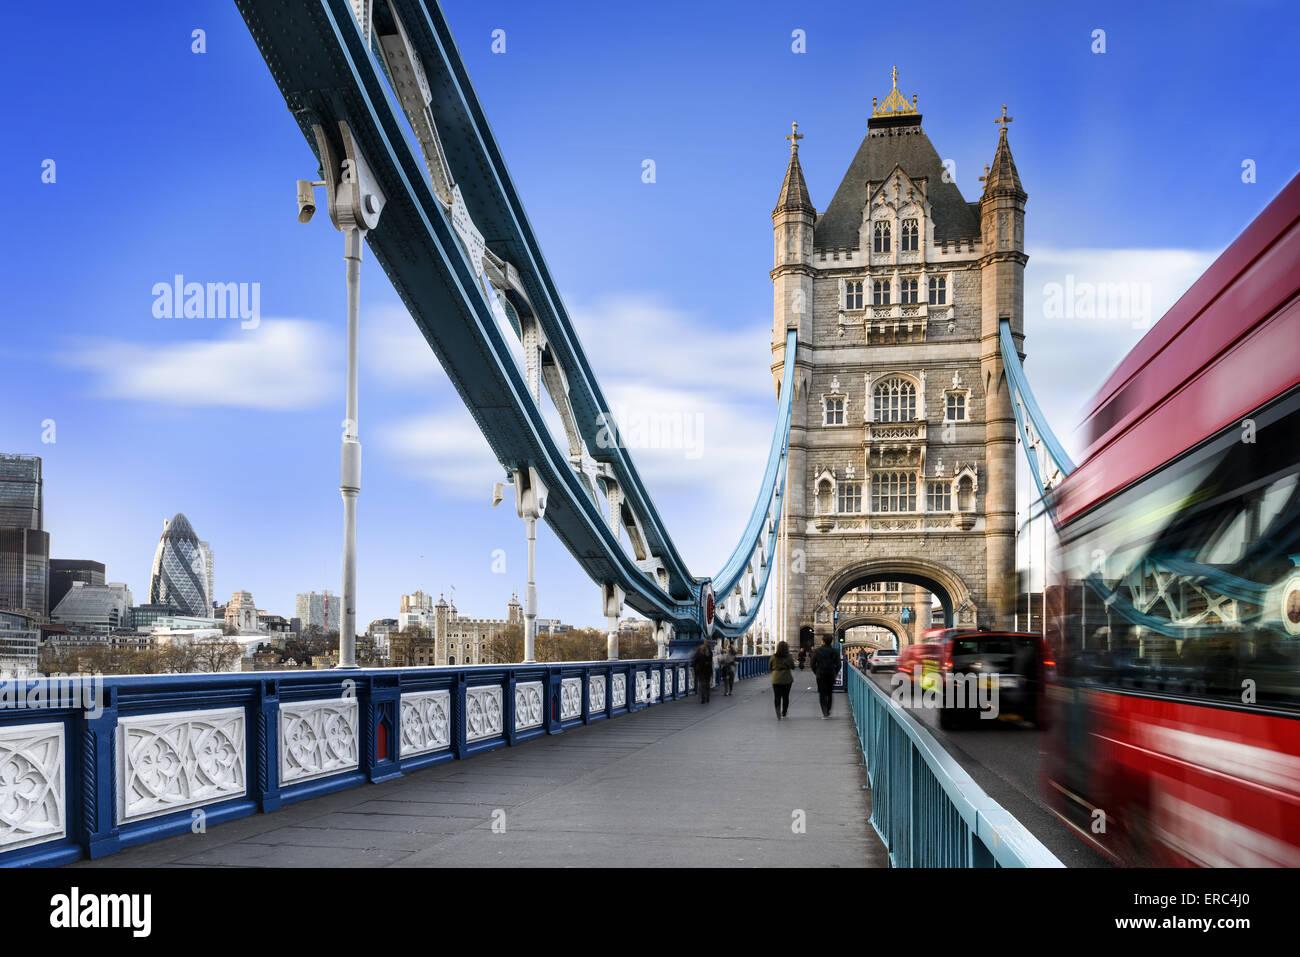 Famoso Tower Bridge con trafic jame, Londra, Inghilterra Immagini Stock